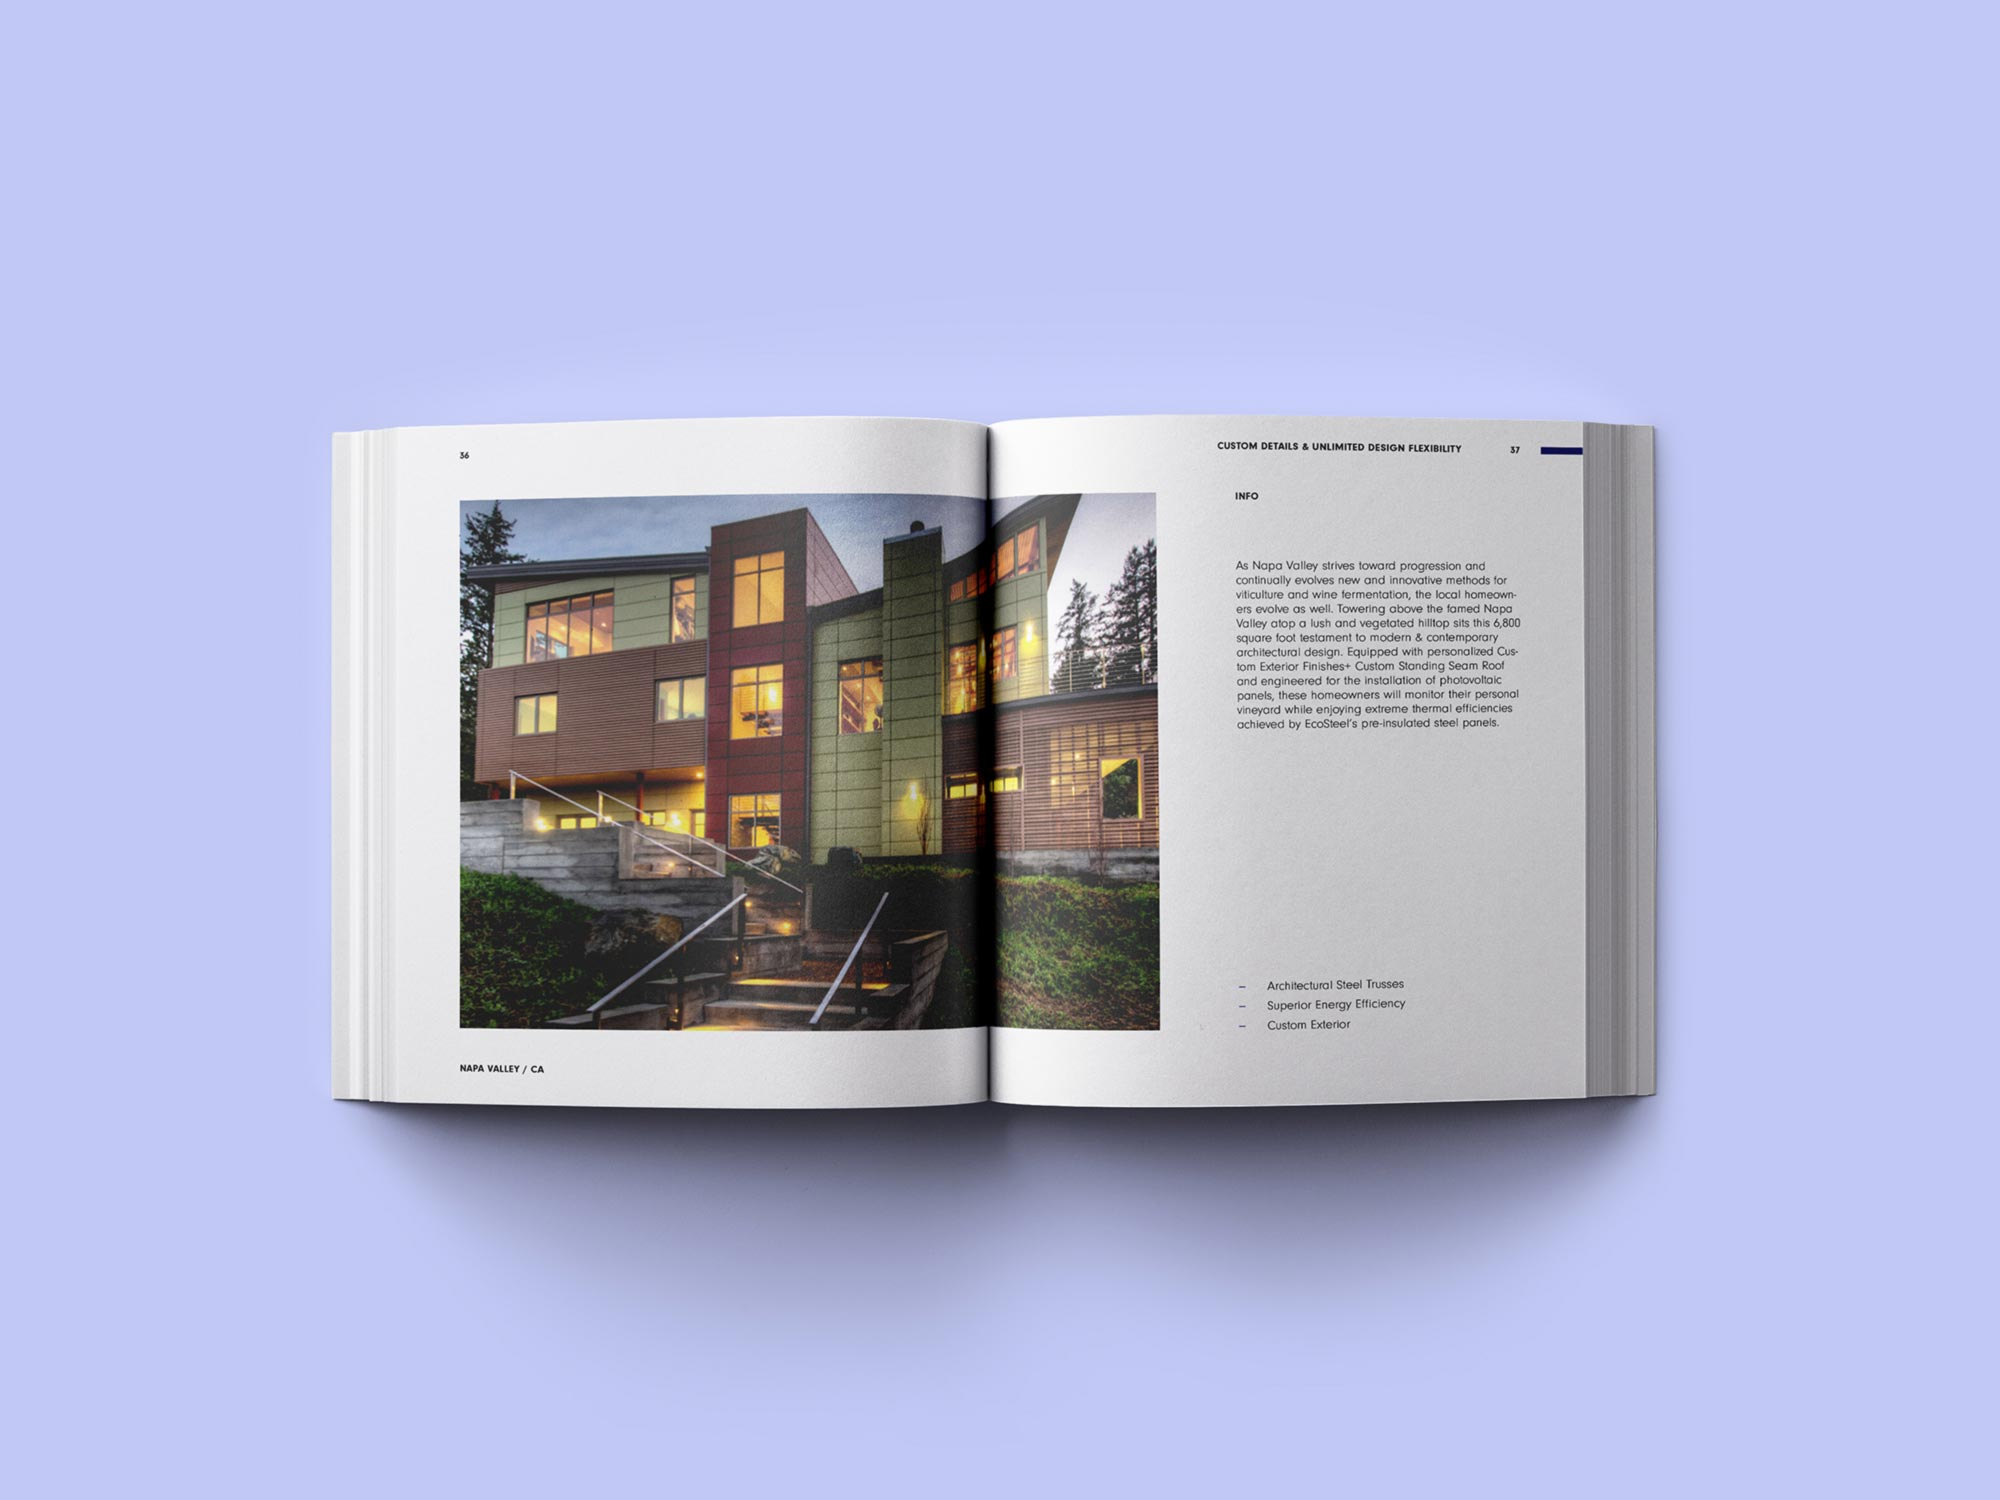 EcoSteel Product Catalog  designed by Happy Buro